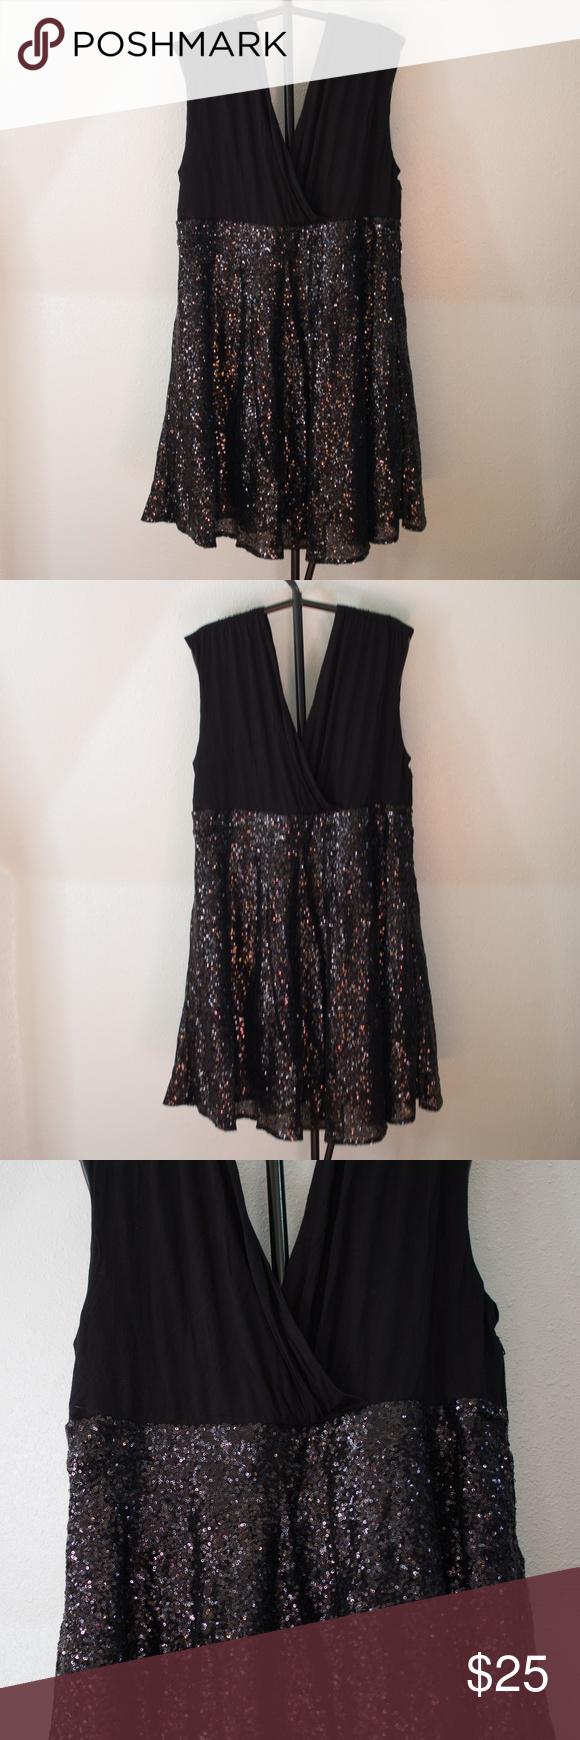 a097bad73cd NWT Torrid Black Sequin Formal Midi Dress Sz 22 Gorgeous all black  sleeveless Torrid midi formal prom dress